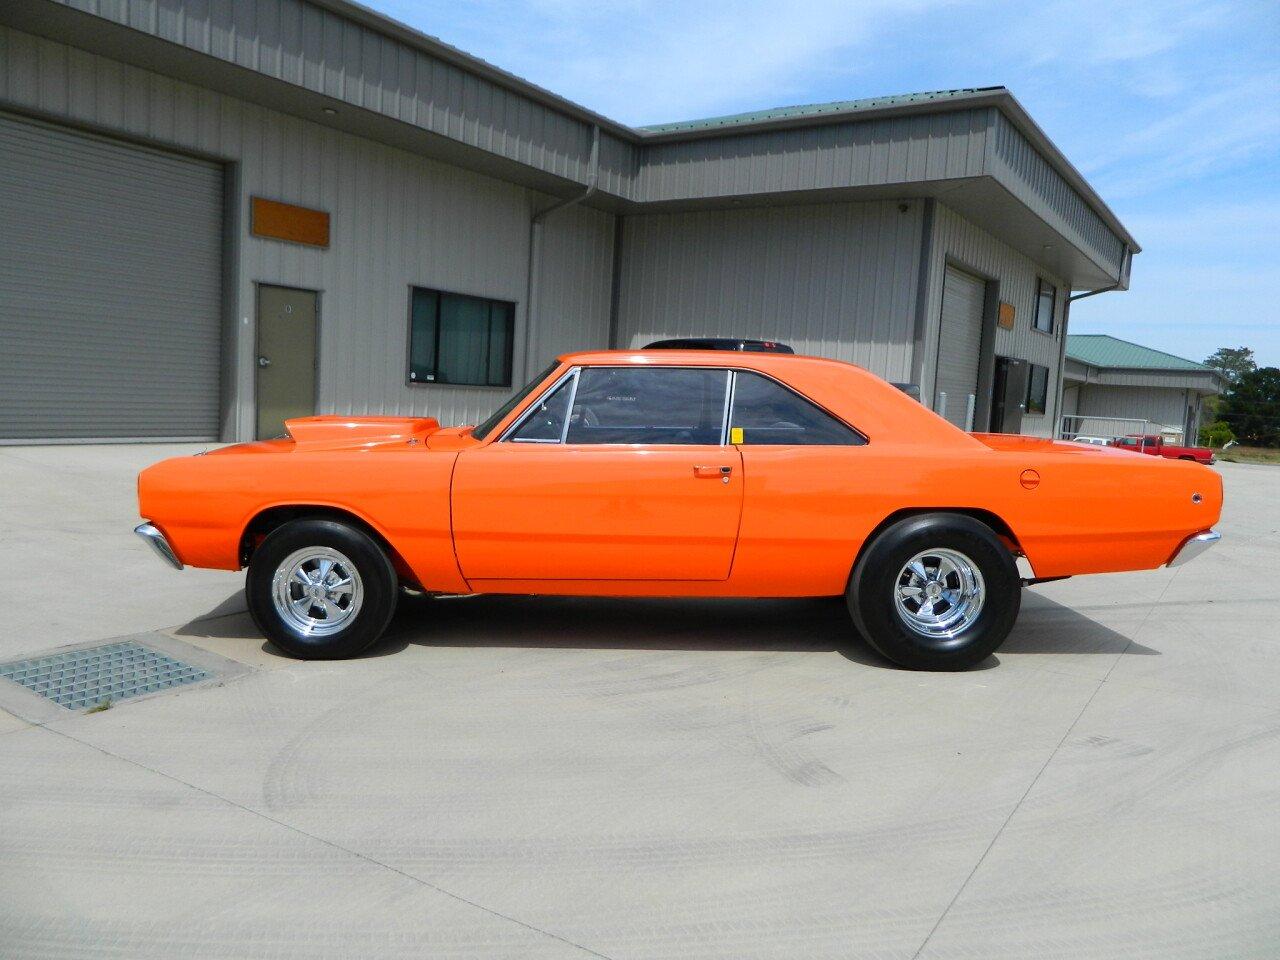 Local Car Auctions >> 1968 Dodge Dart for sale near Orange, California 92867 ...